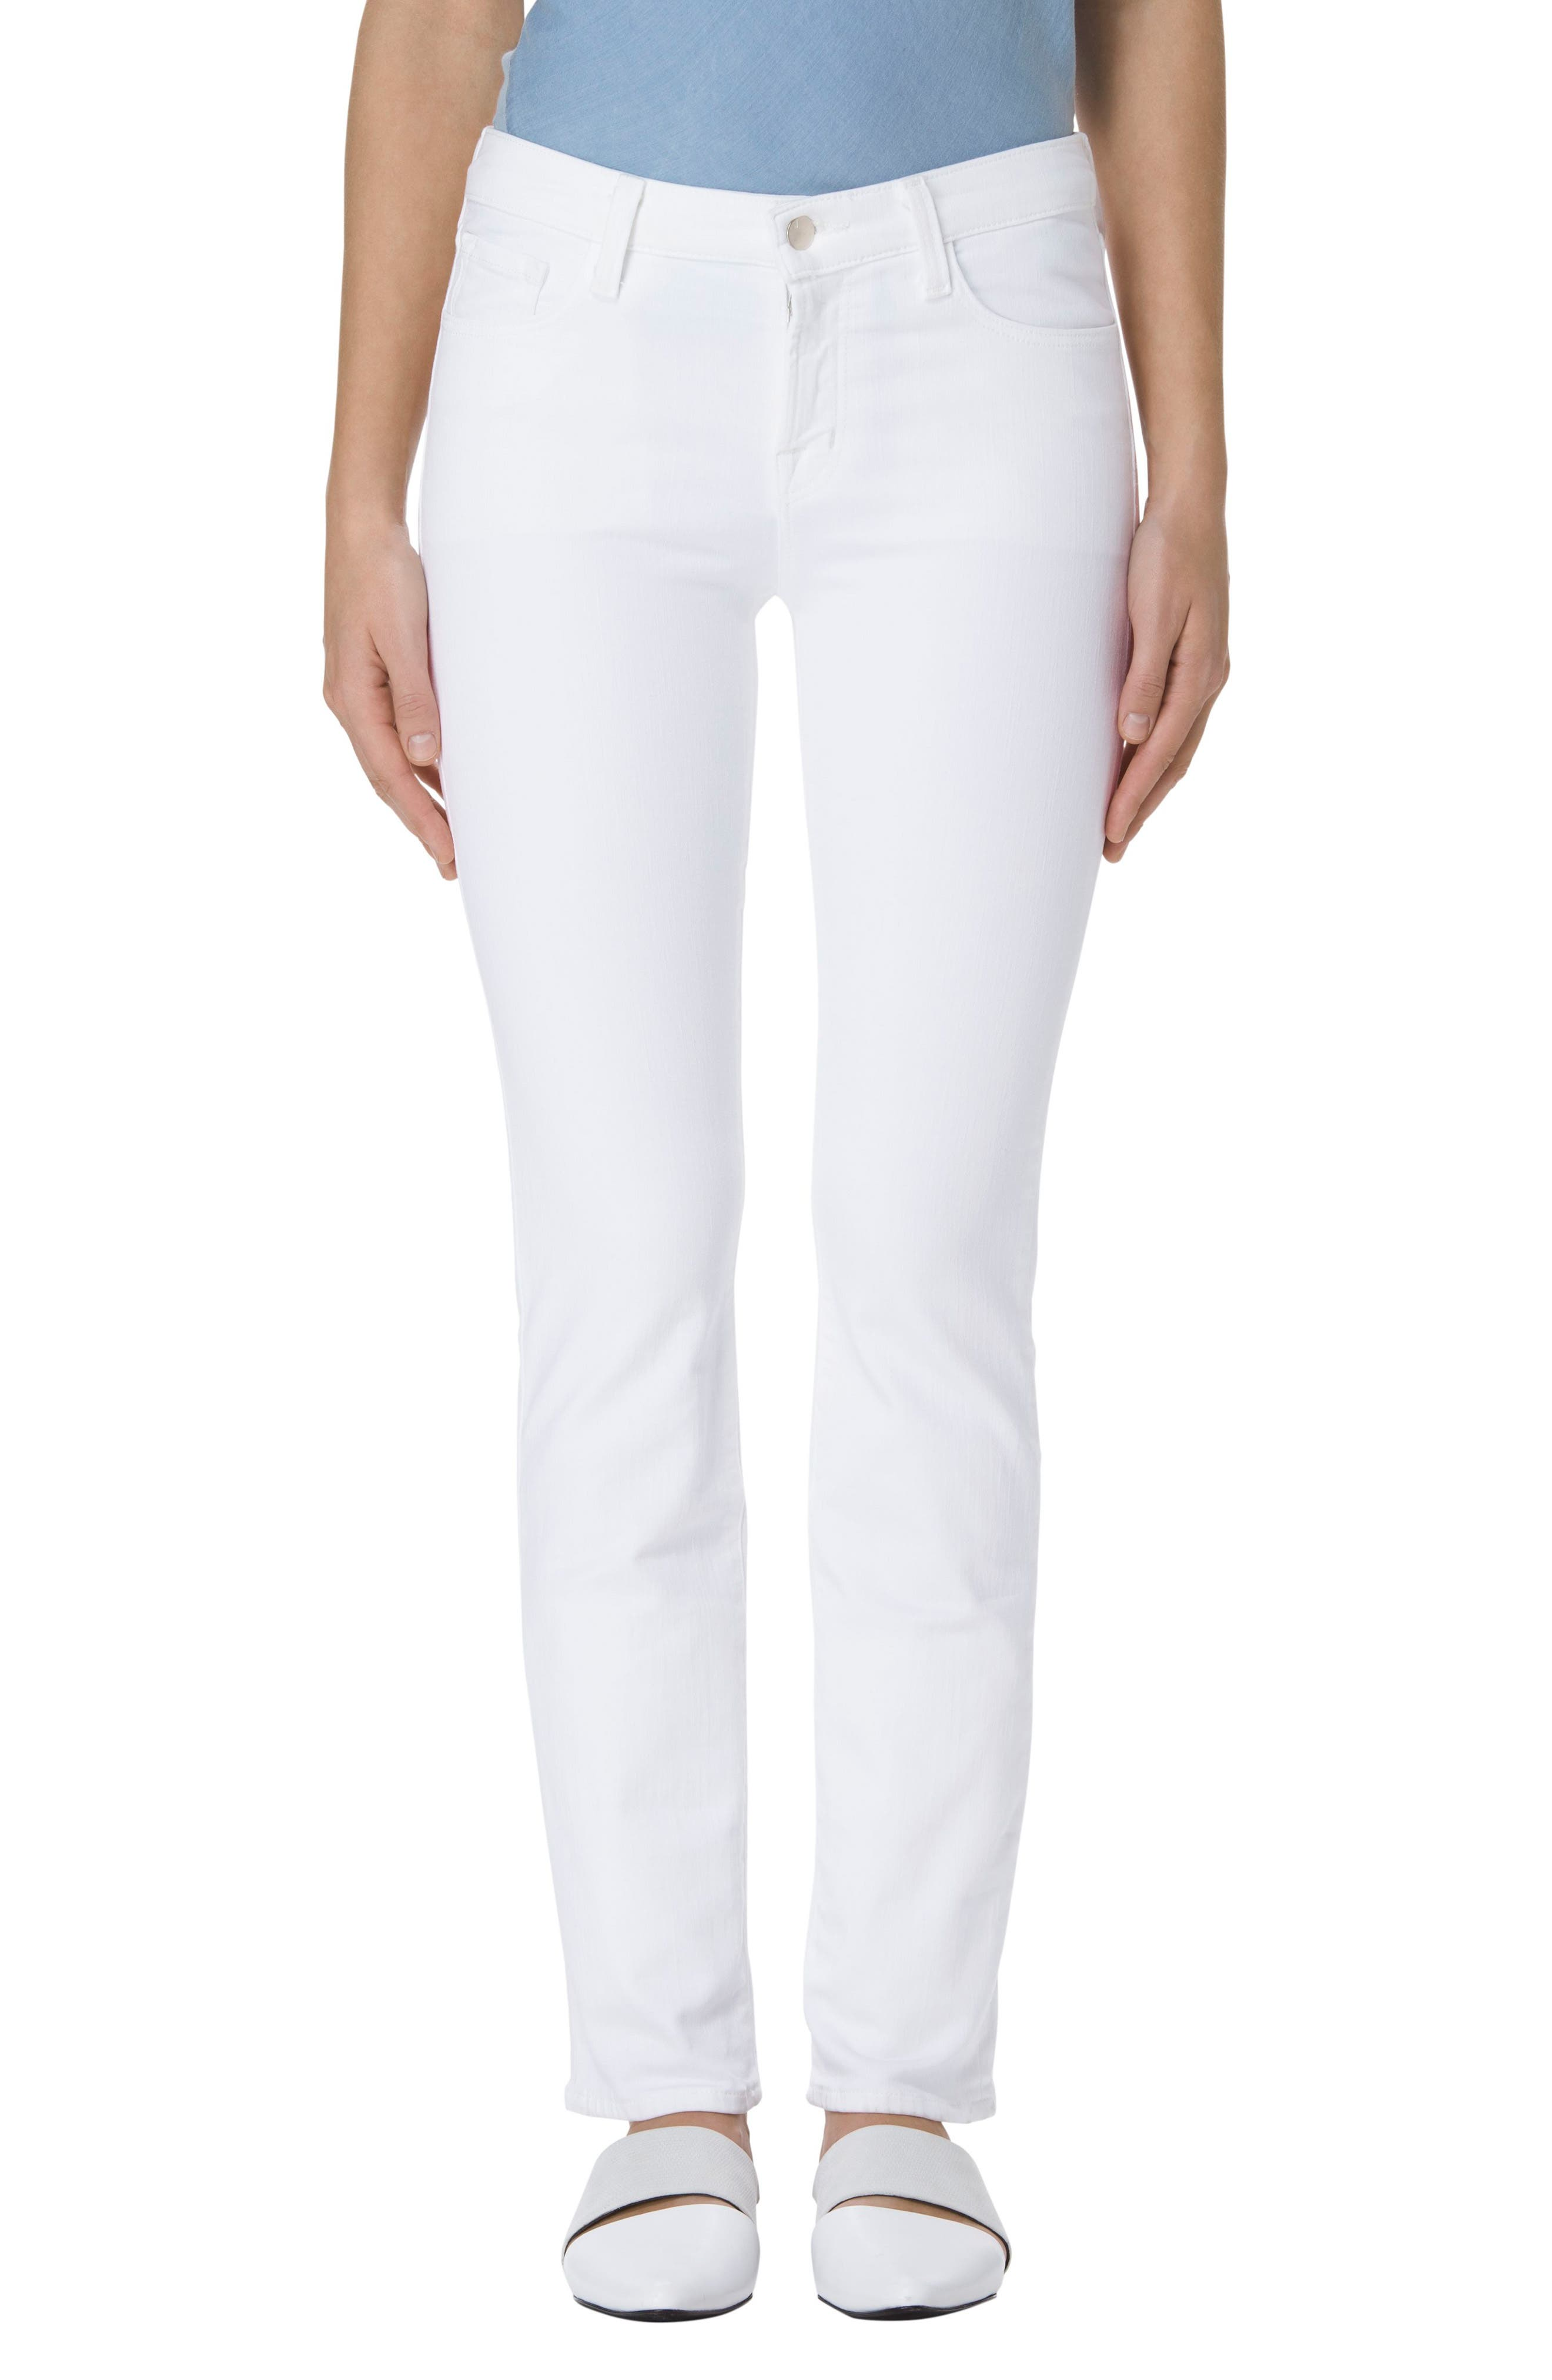 Alternate Image 1 Selected - J Brand Amelia Straight Leg Jeans (Blanc)